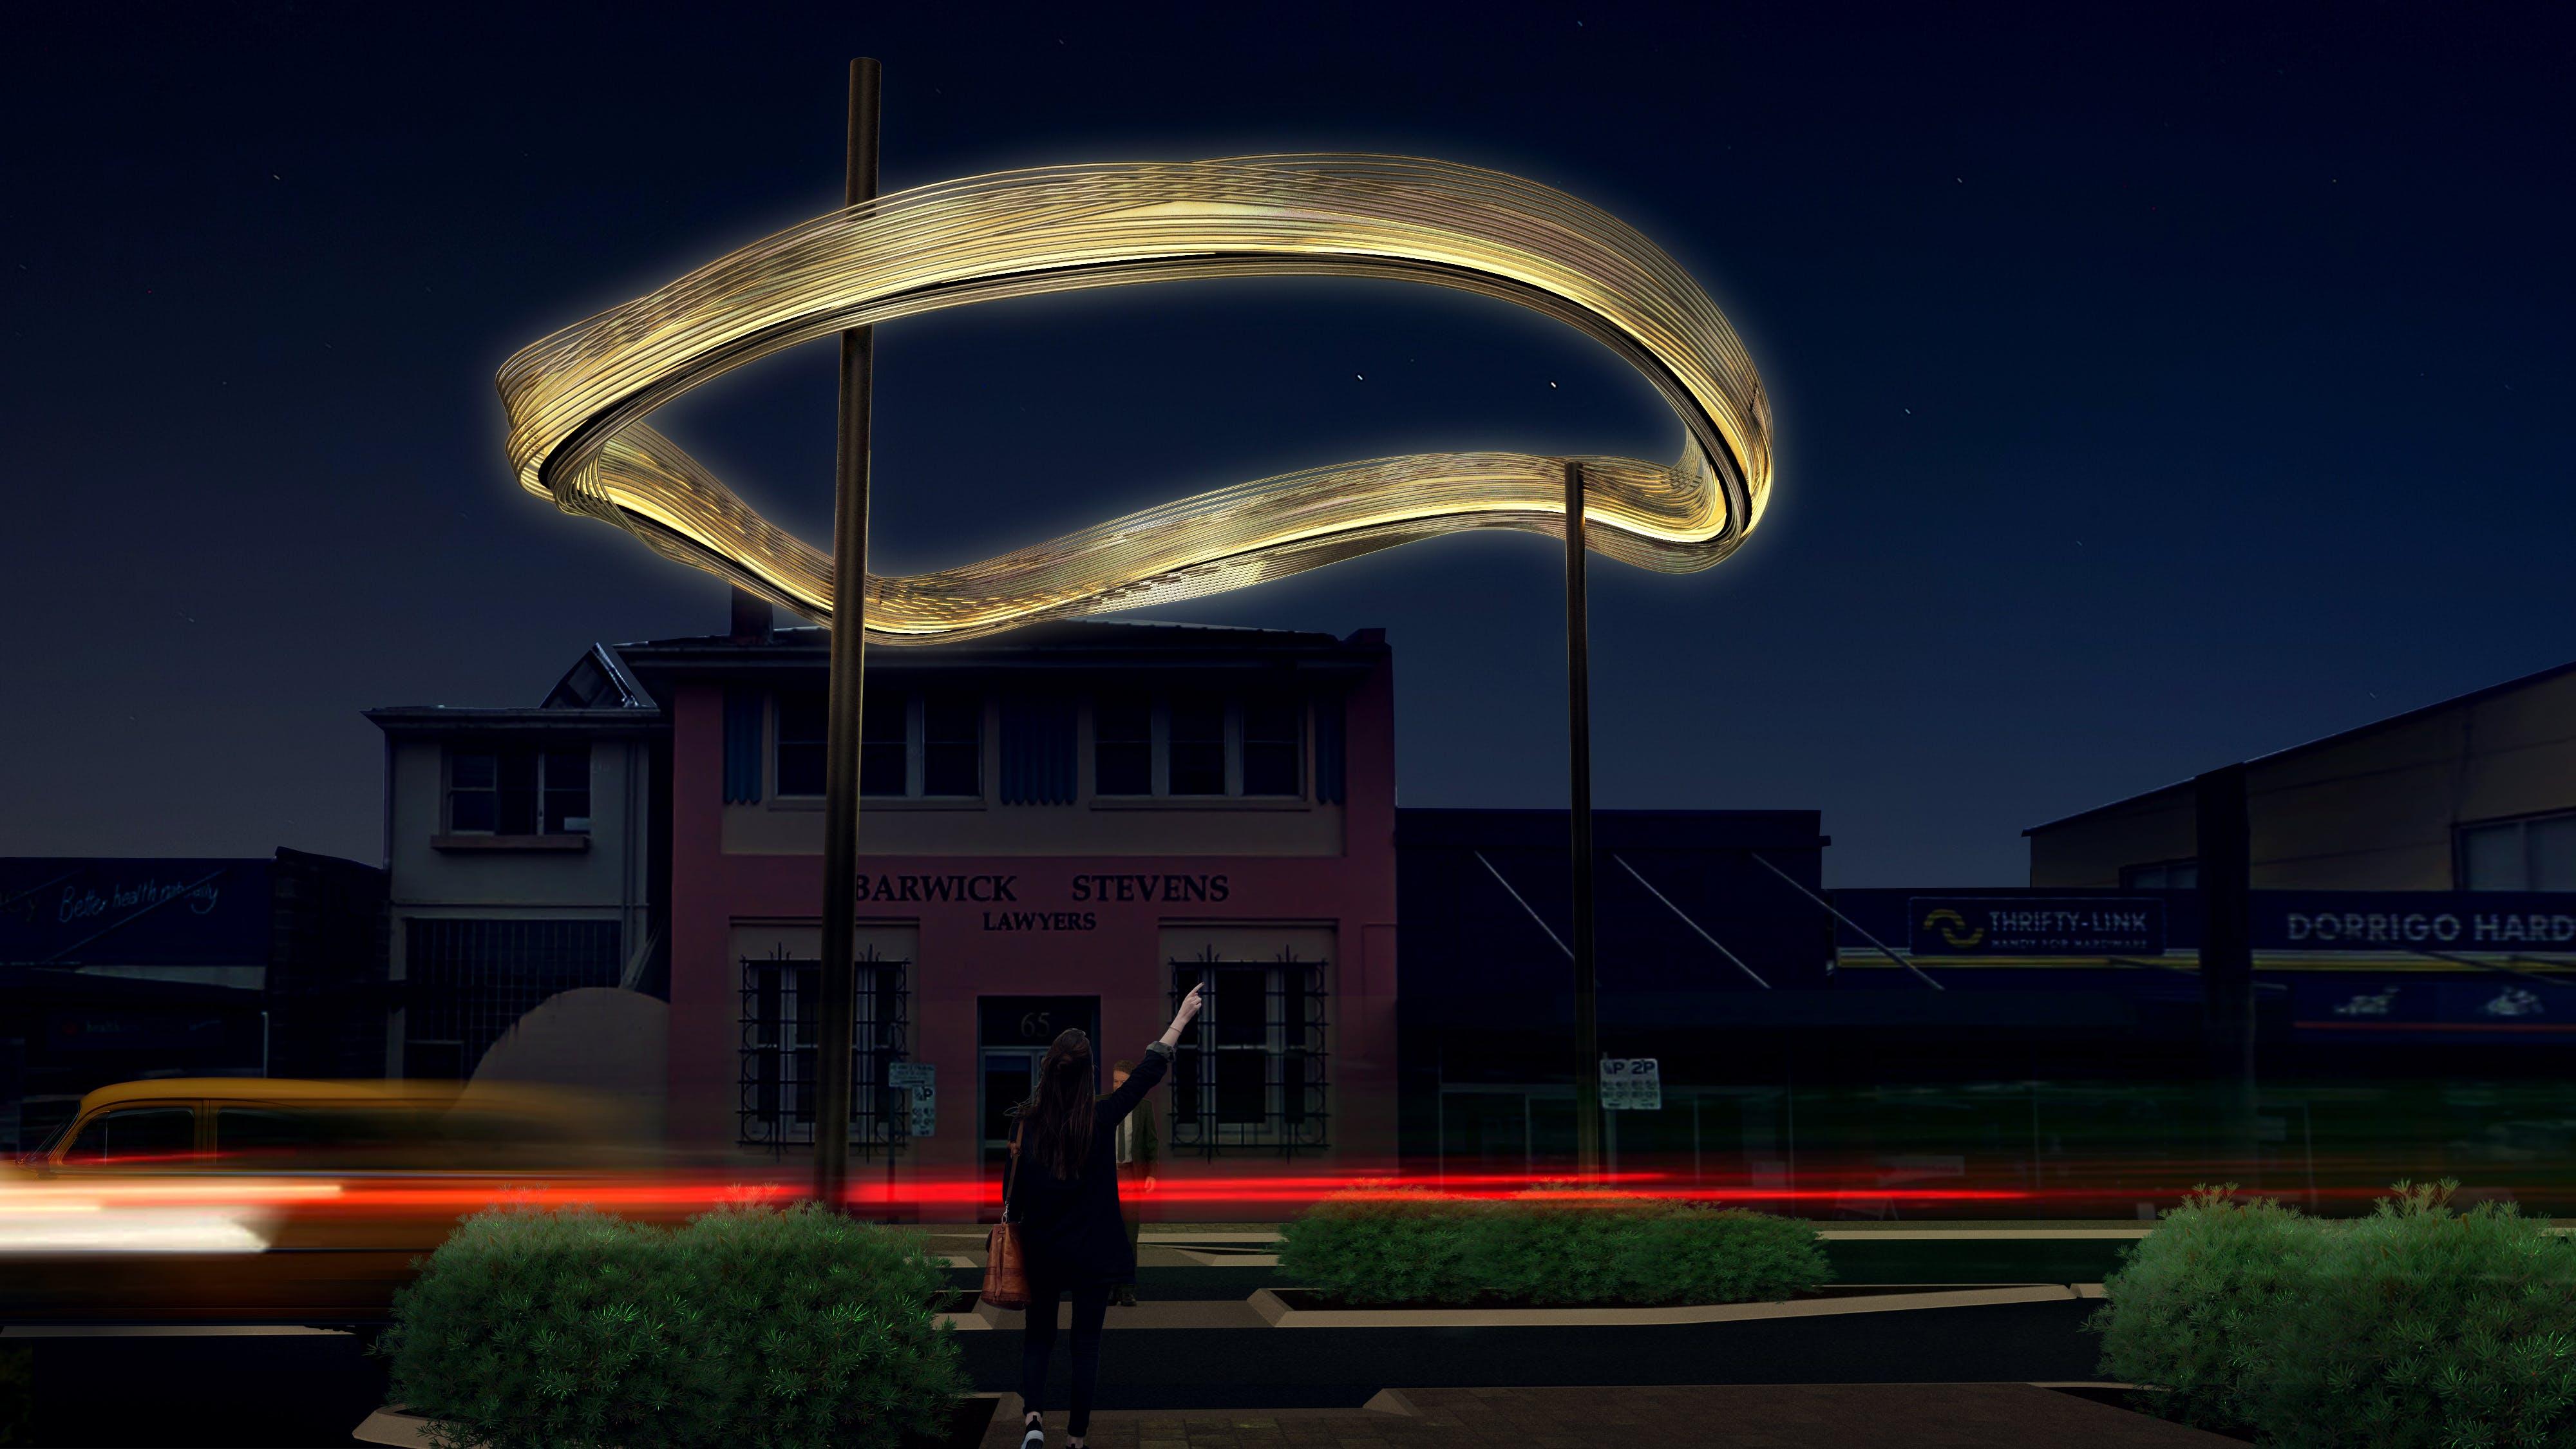 Proposed art work at night